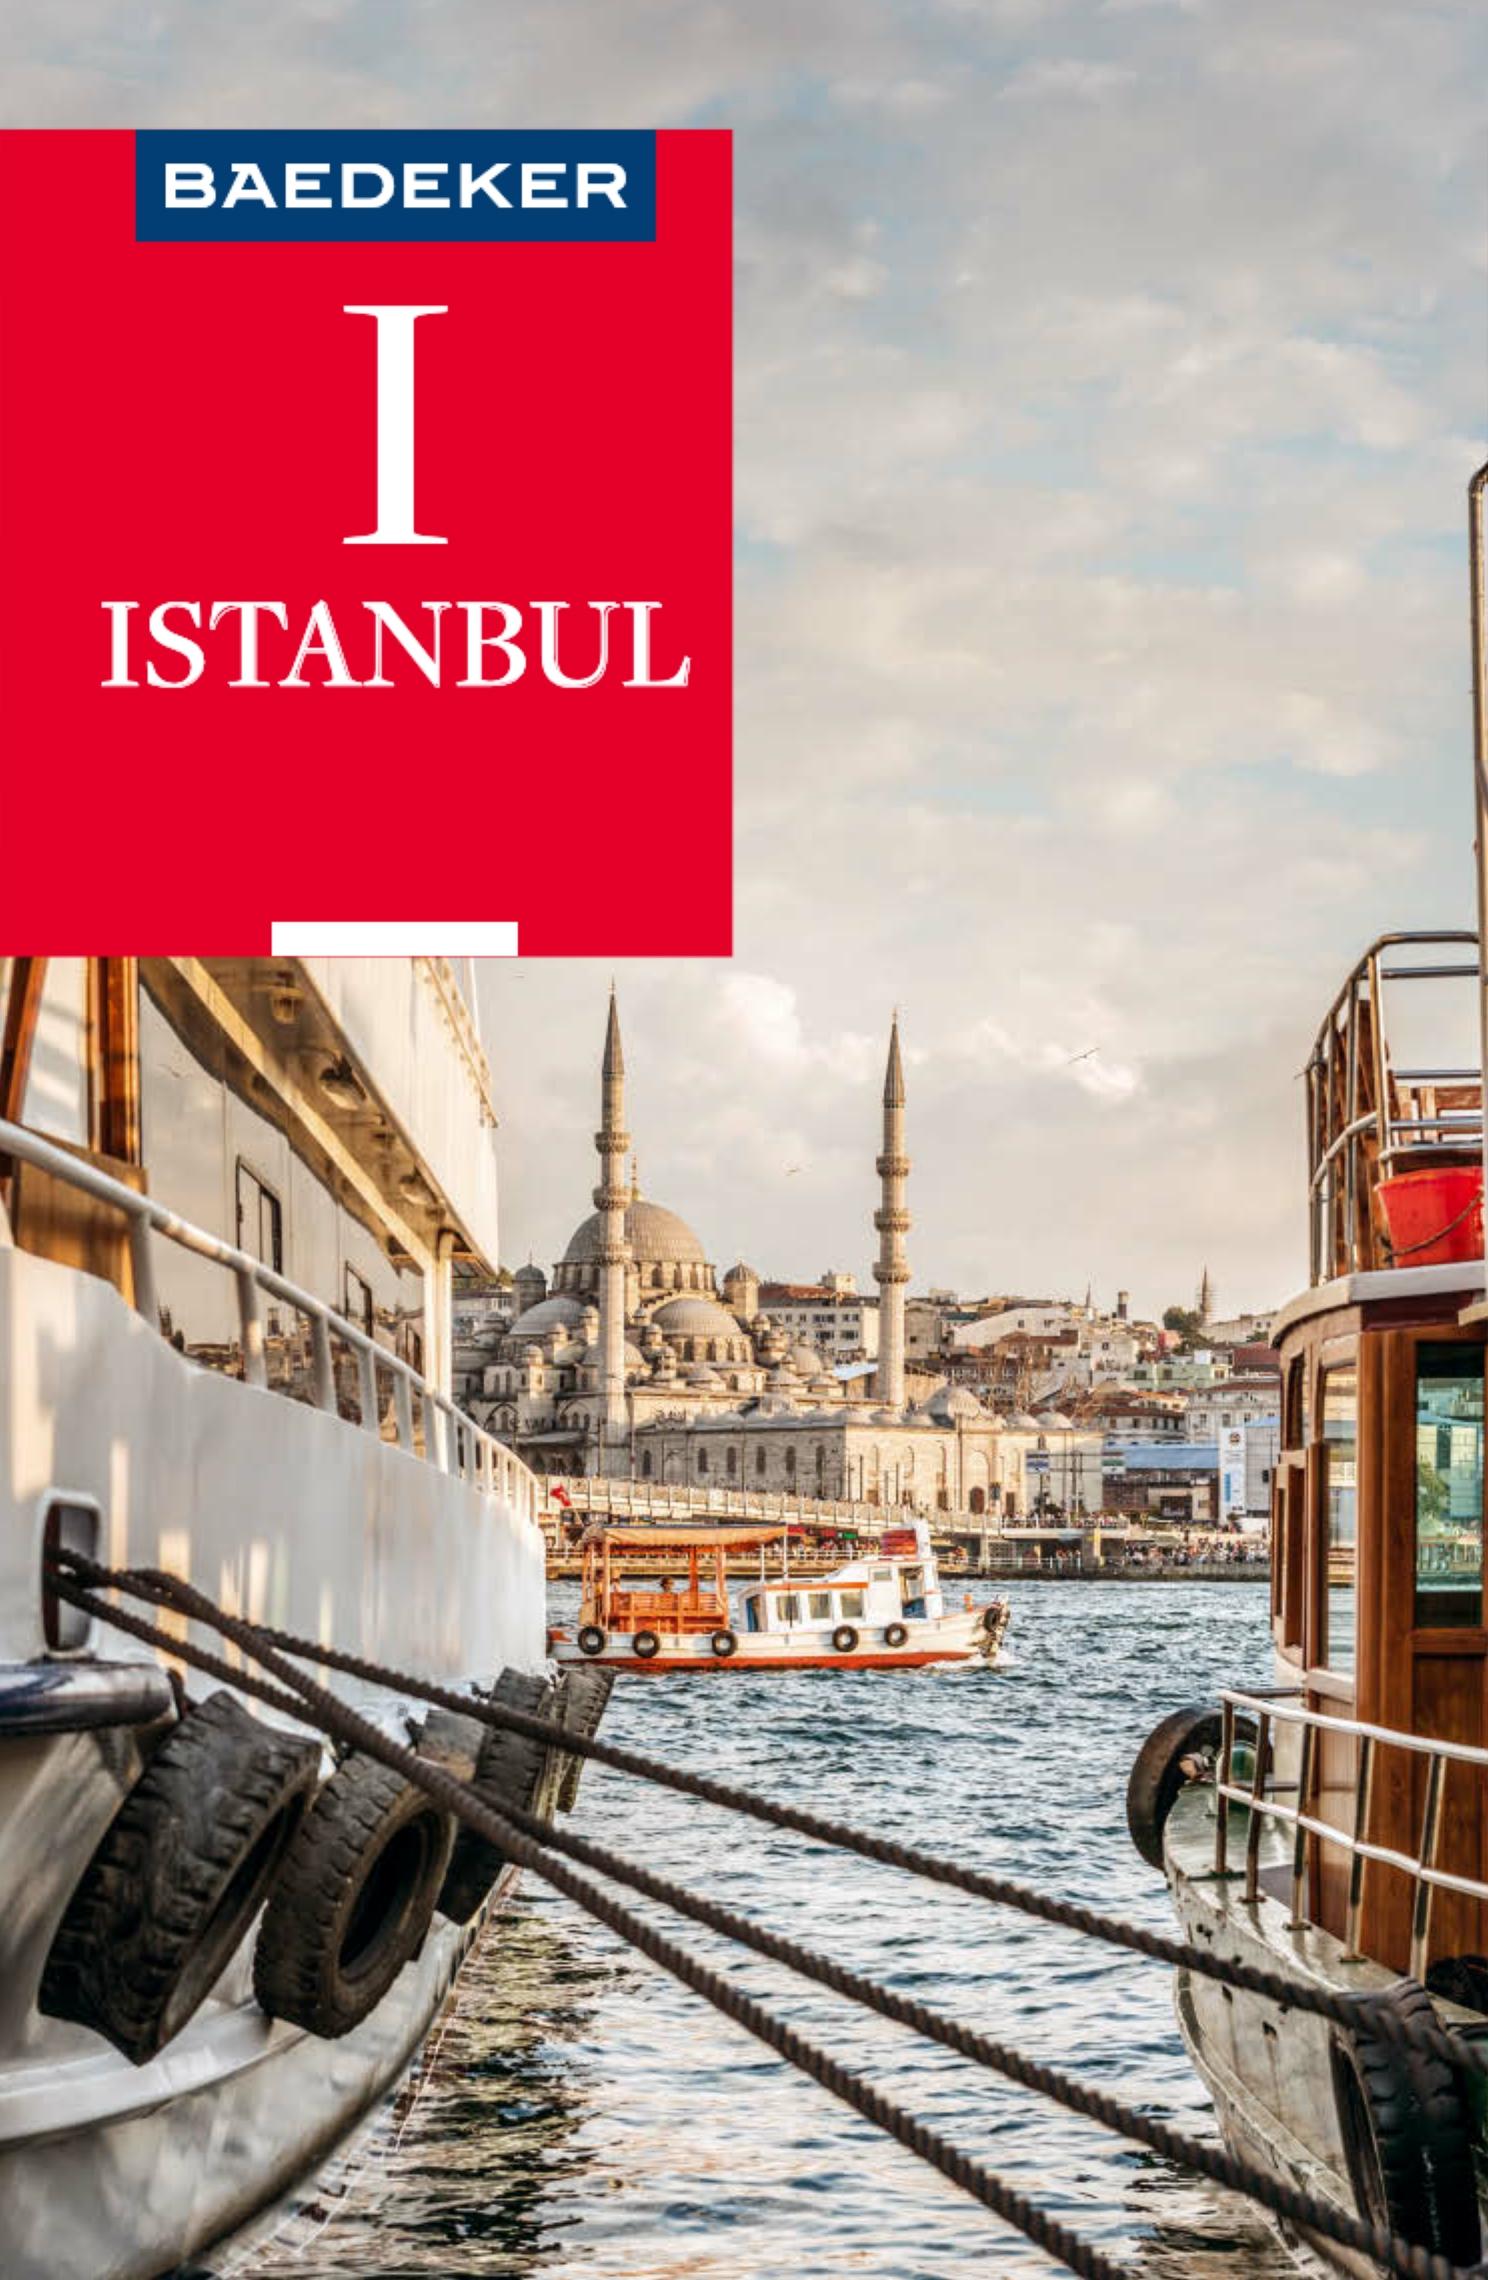 Baedeker - Istanbul (Cover)